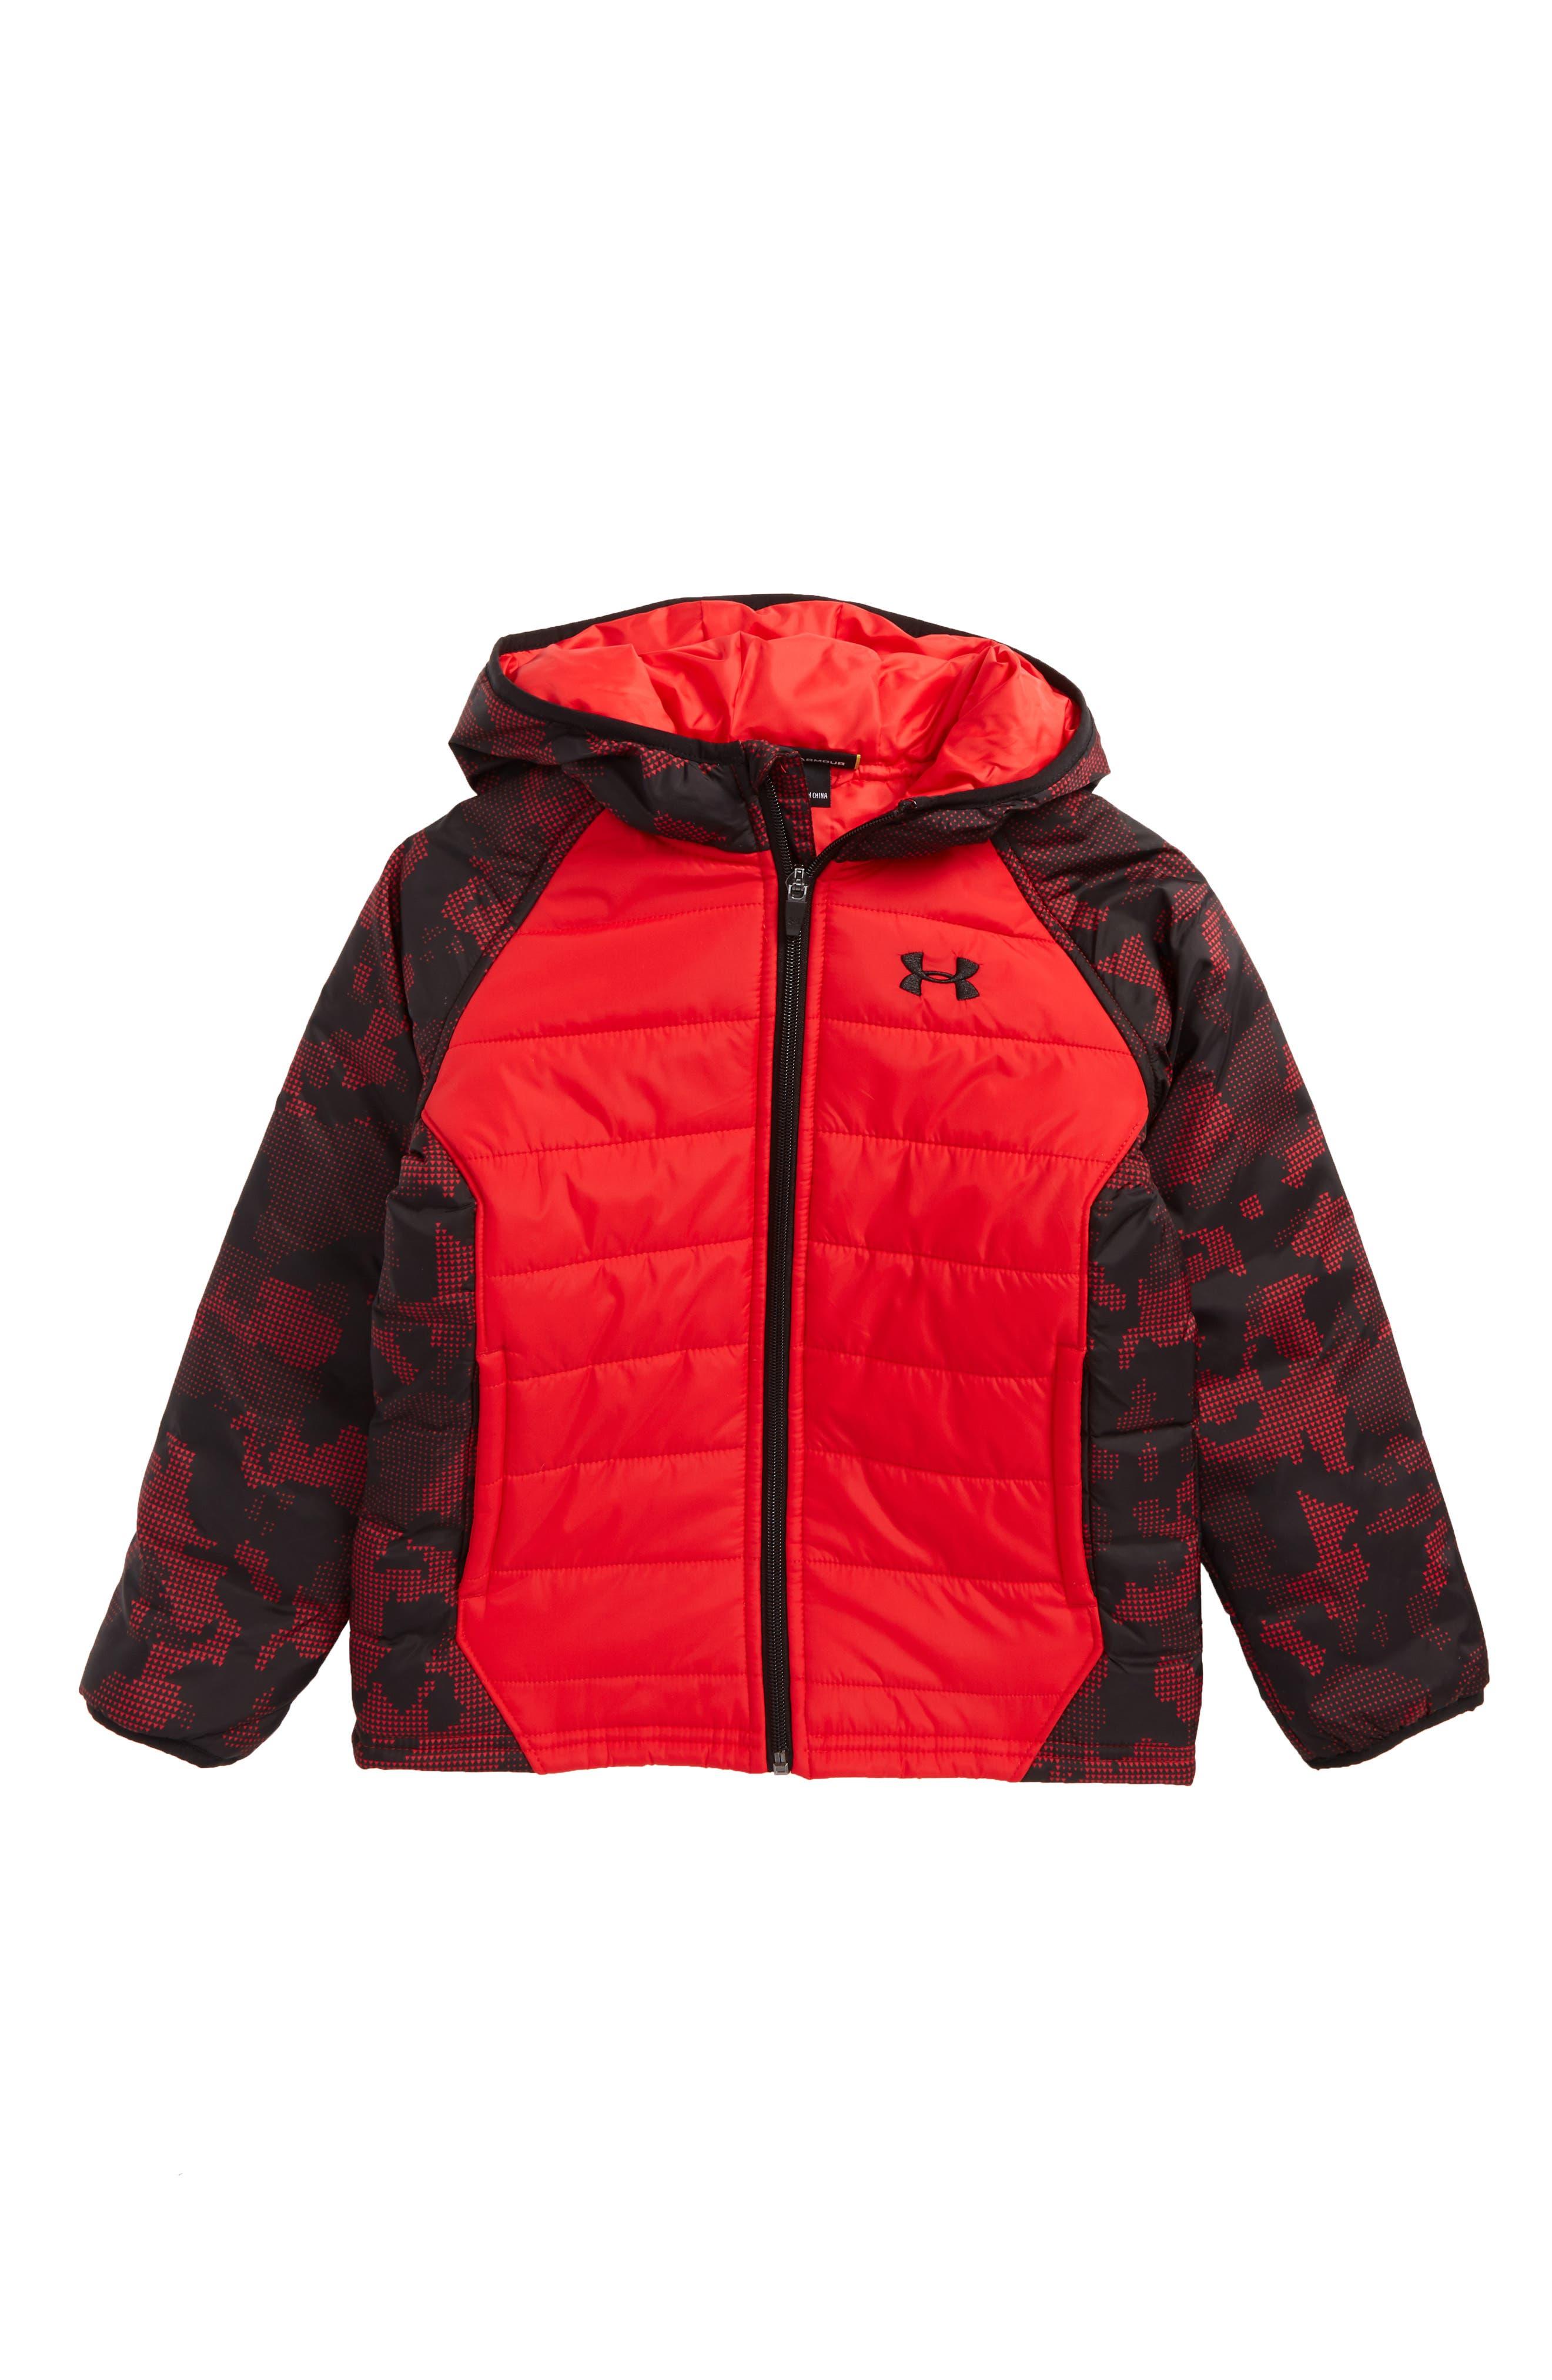 cd23e5369 Cheap ua coat Buy Online >OFF38% Discounted